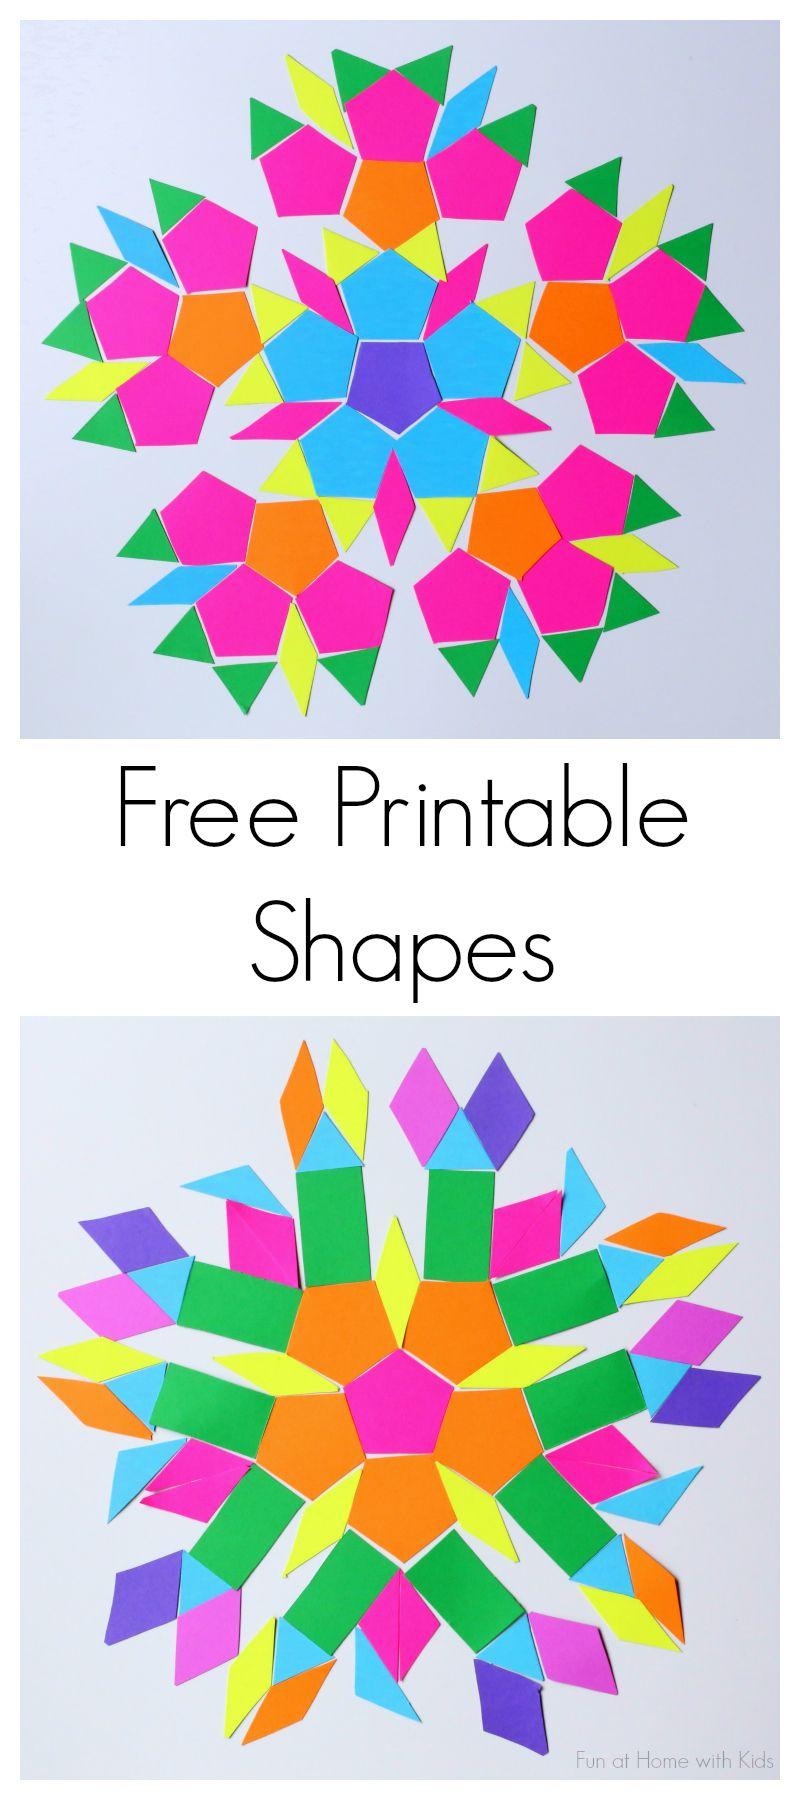 Free Printable Shapes For Travel Kit | Formes Geo - Free Printable Shapes